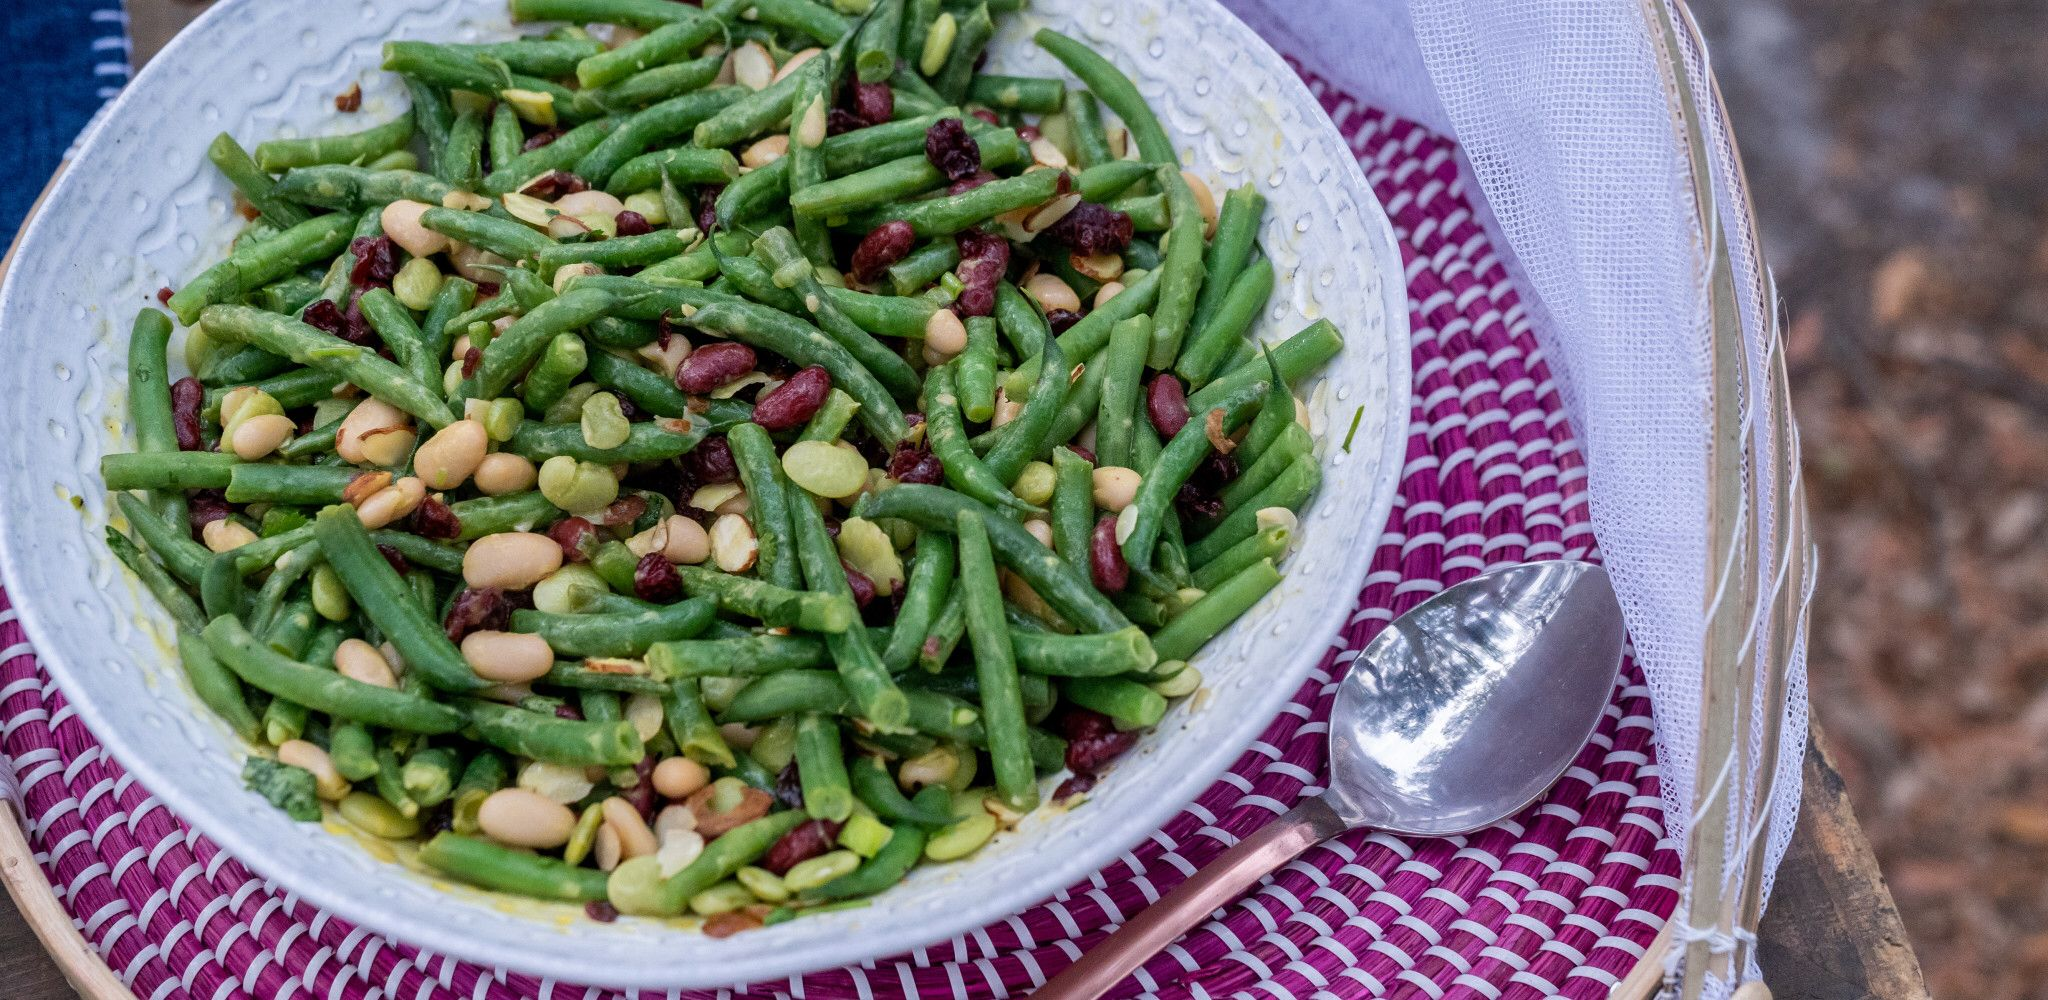 Four Bean Salad Recipe In 2020 Four Bean Salad Bean Salad Food Network Recipes